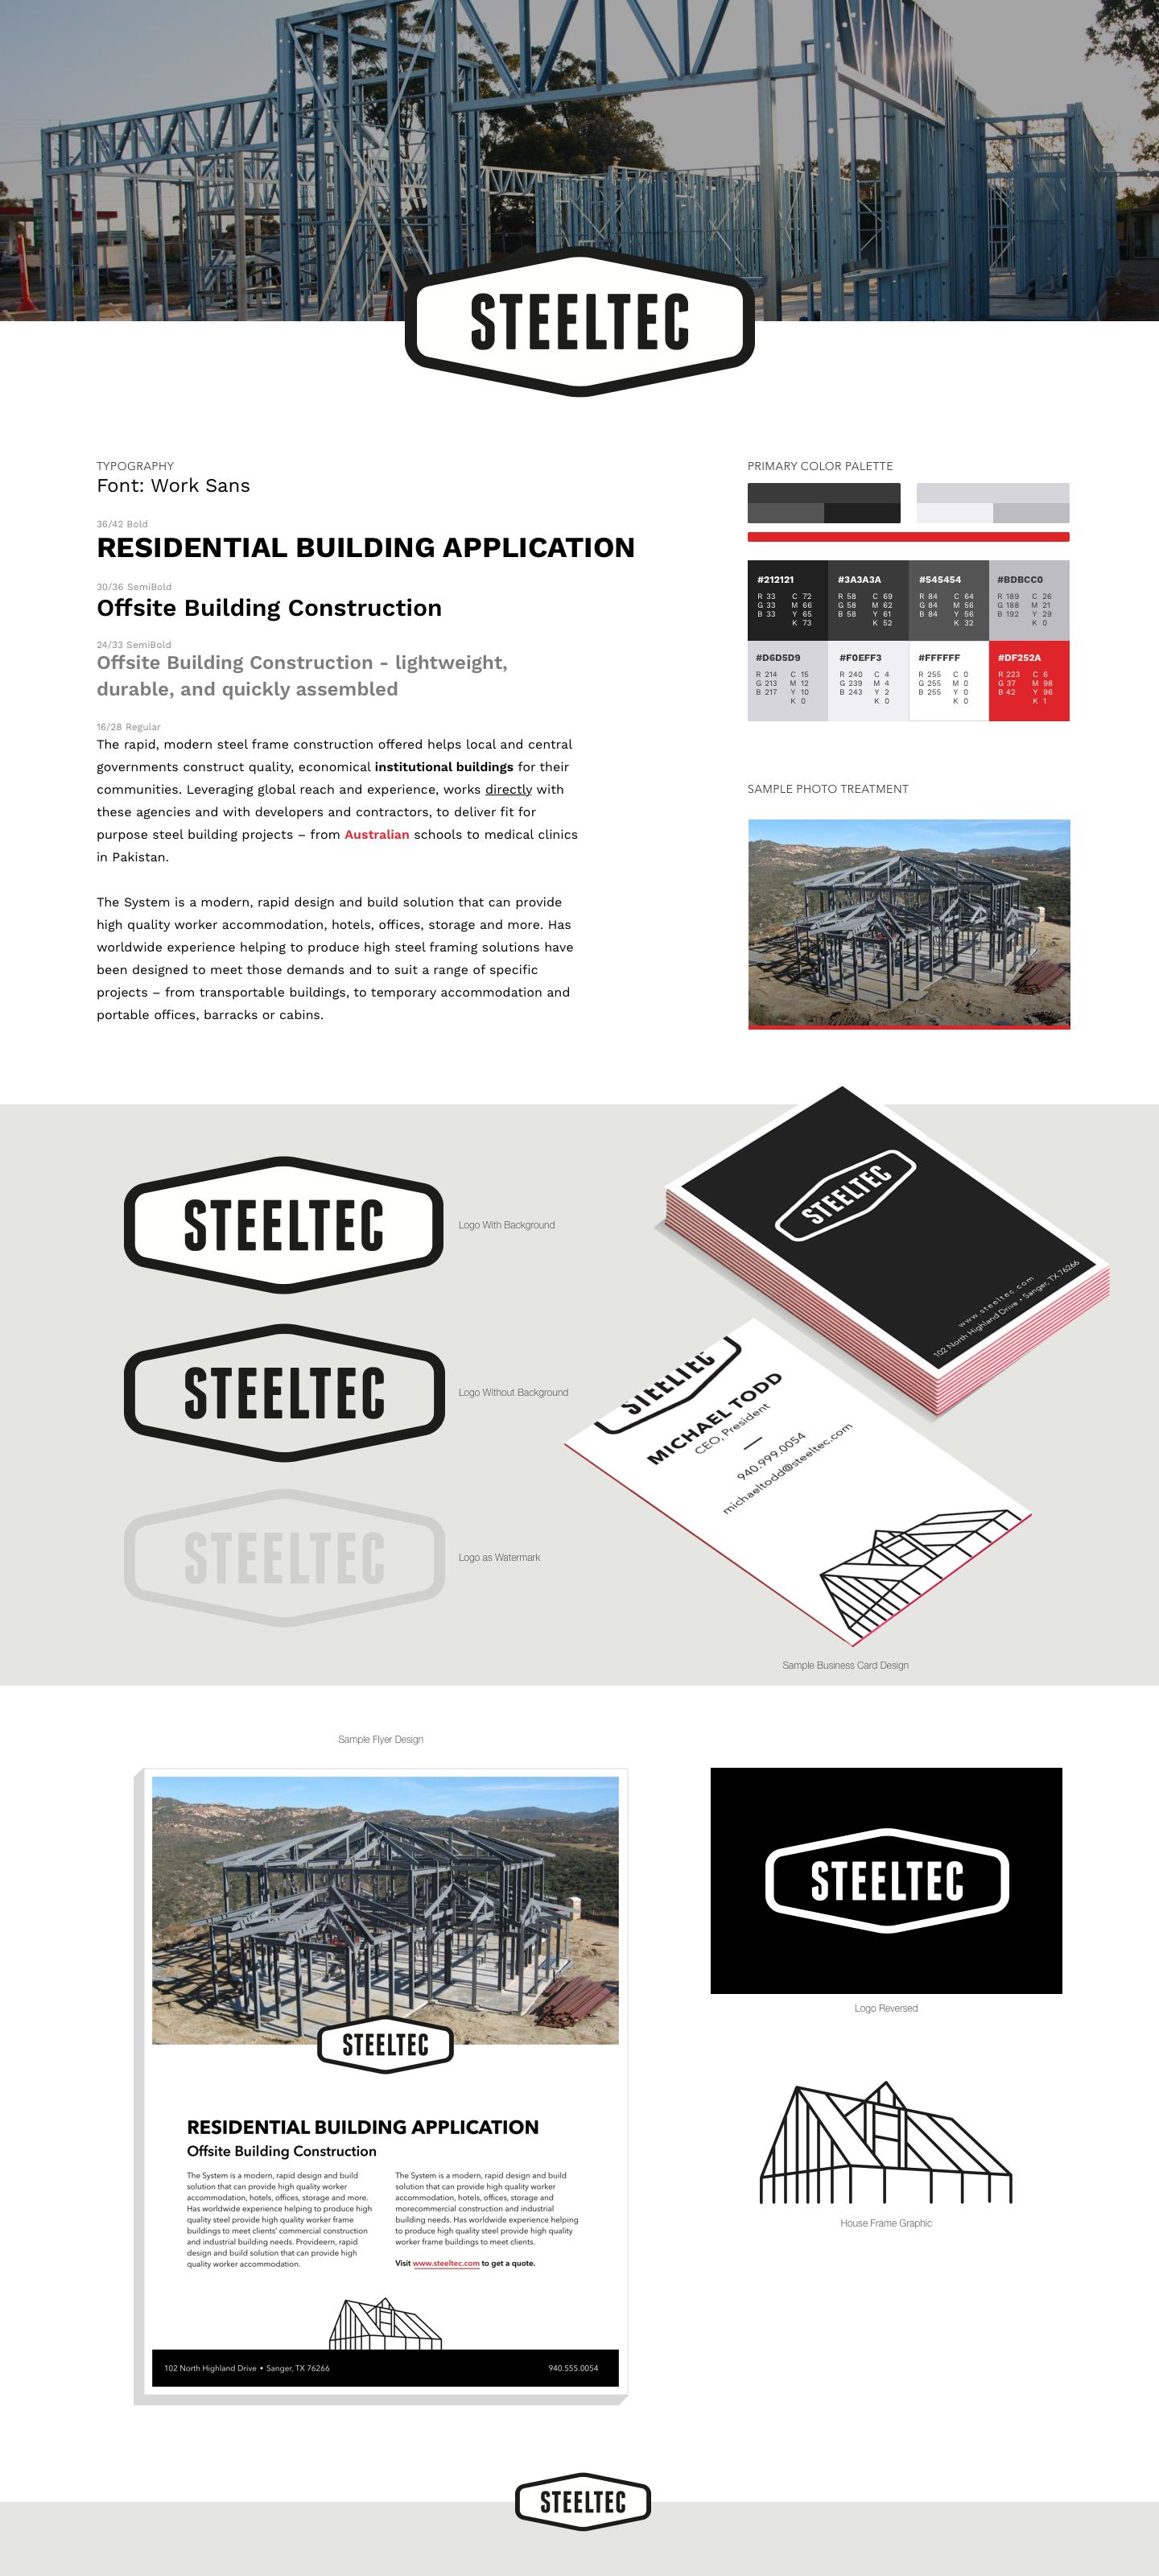 steeltec-styletile